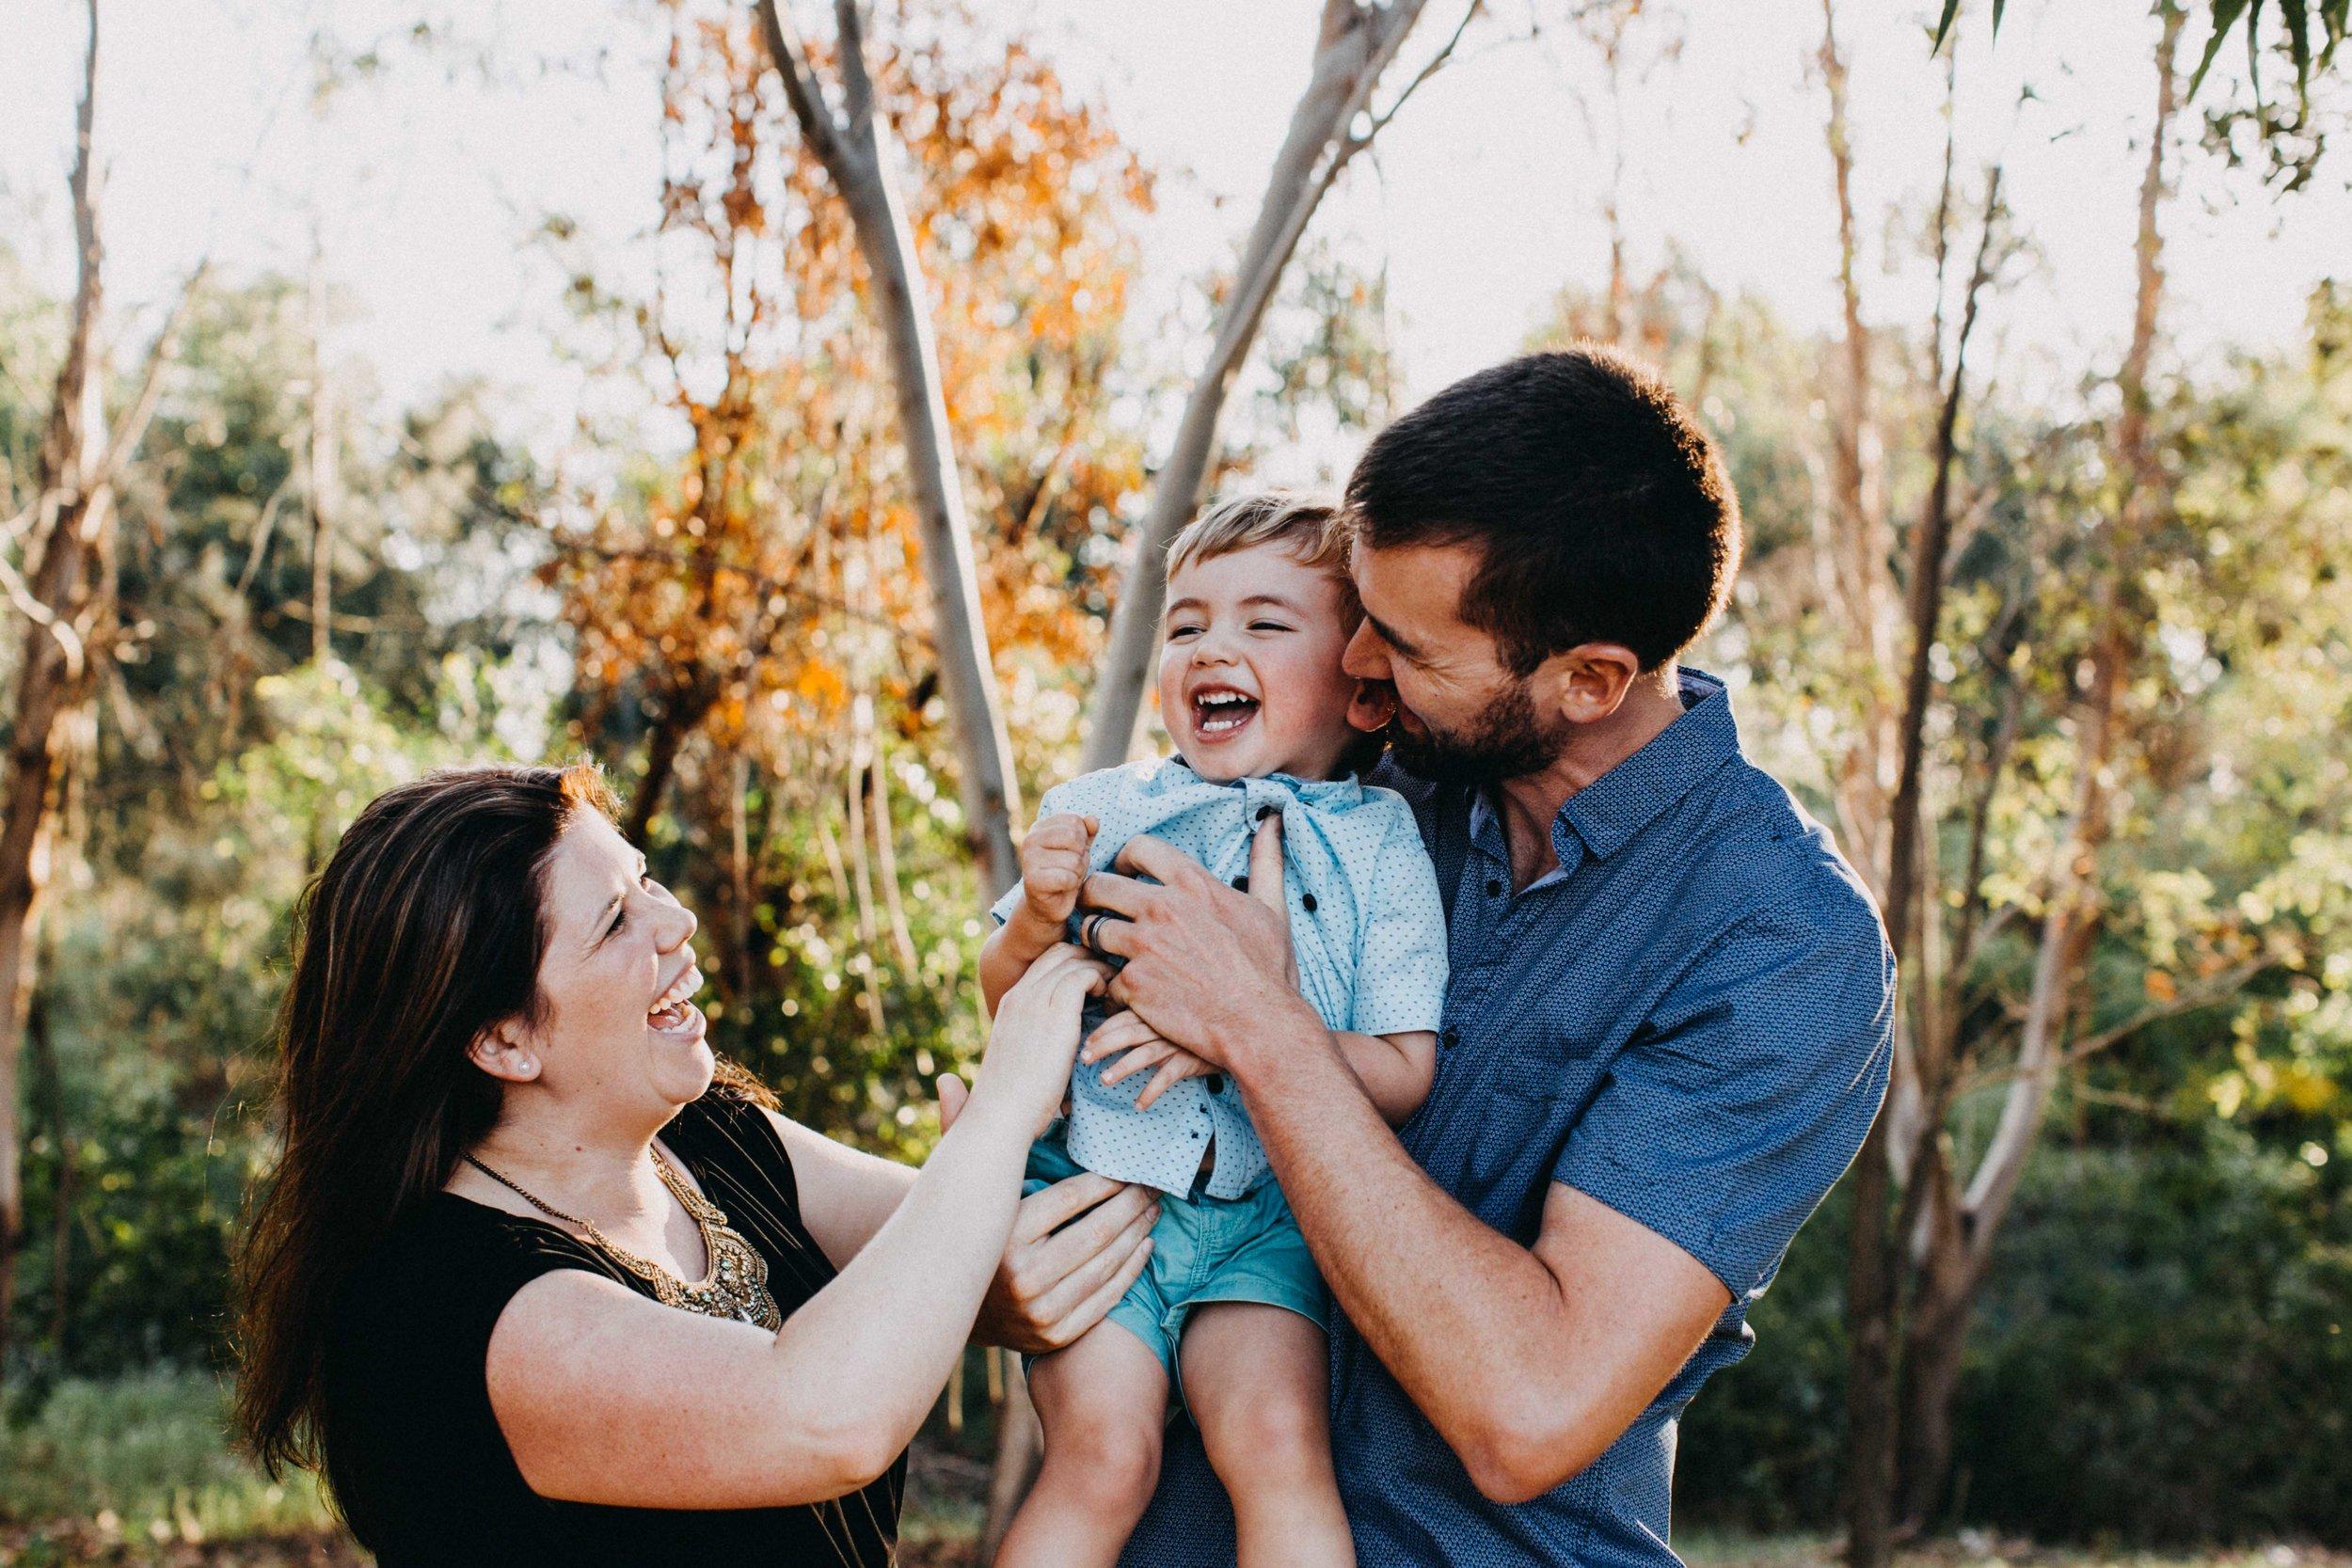 jackson-family-camden-photography-portrait-macarthur-12.jpg